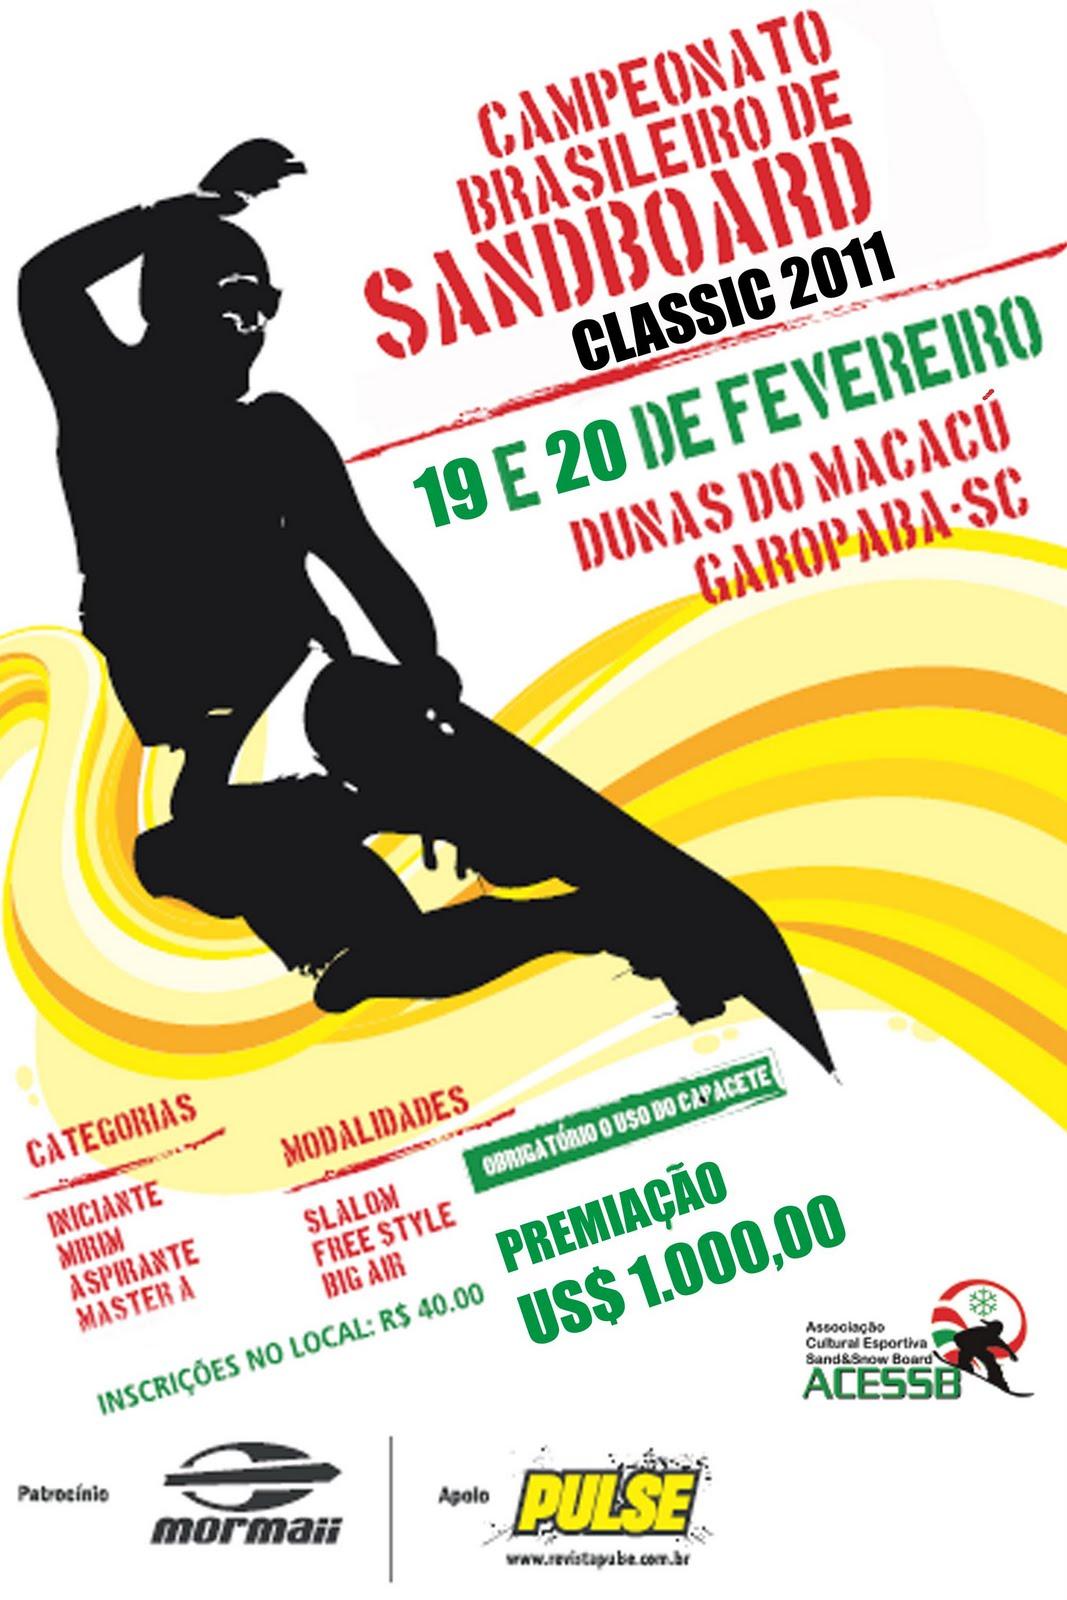 Confirmado o Sandboard Classic 2011 - Garopaba